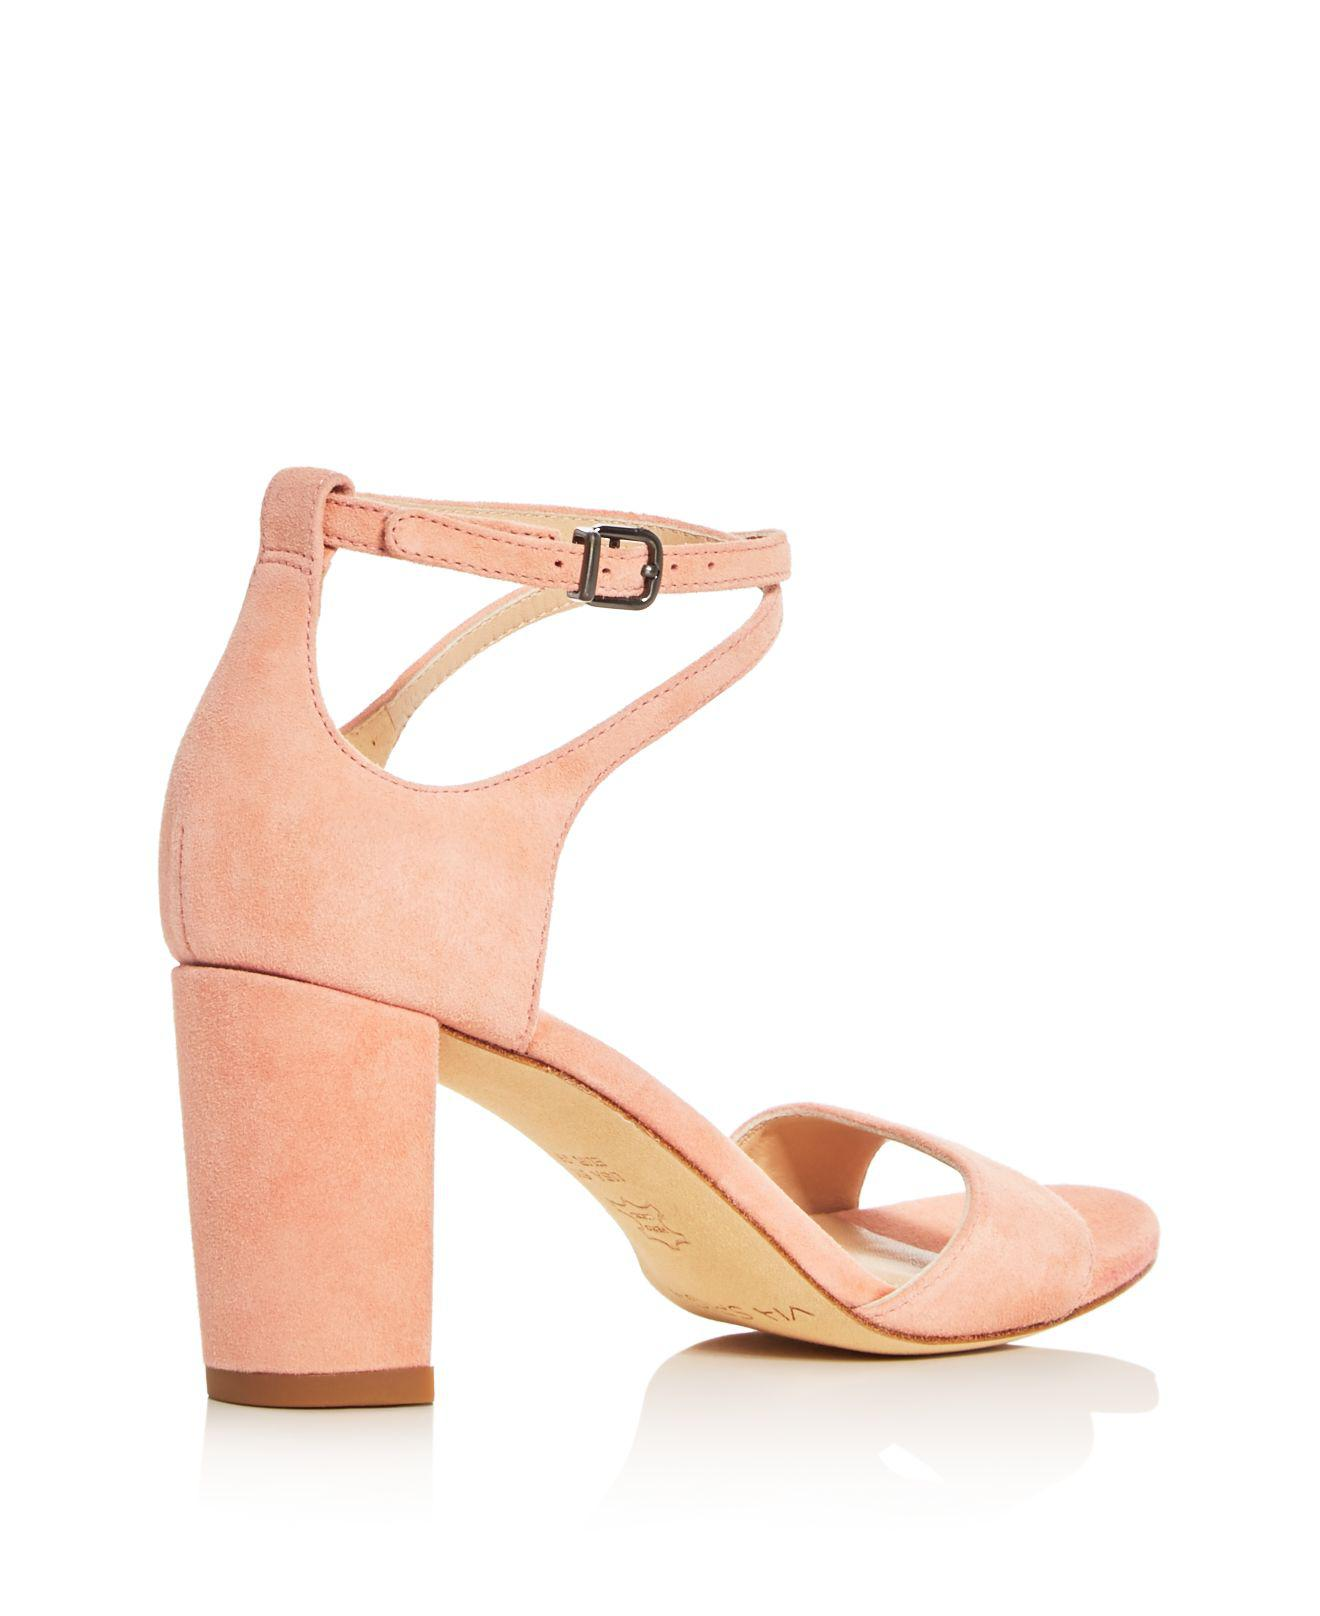 60123f1ebeb Lyst - Via Spiga Wendi Crisscross Ankle Strap High Heel Sandals